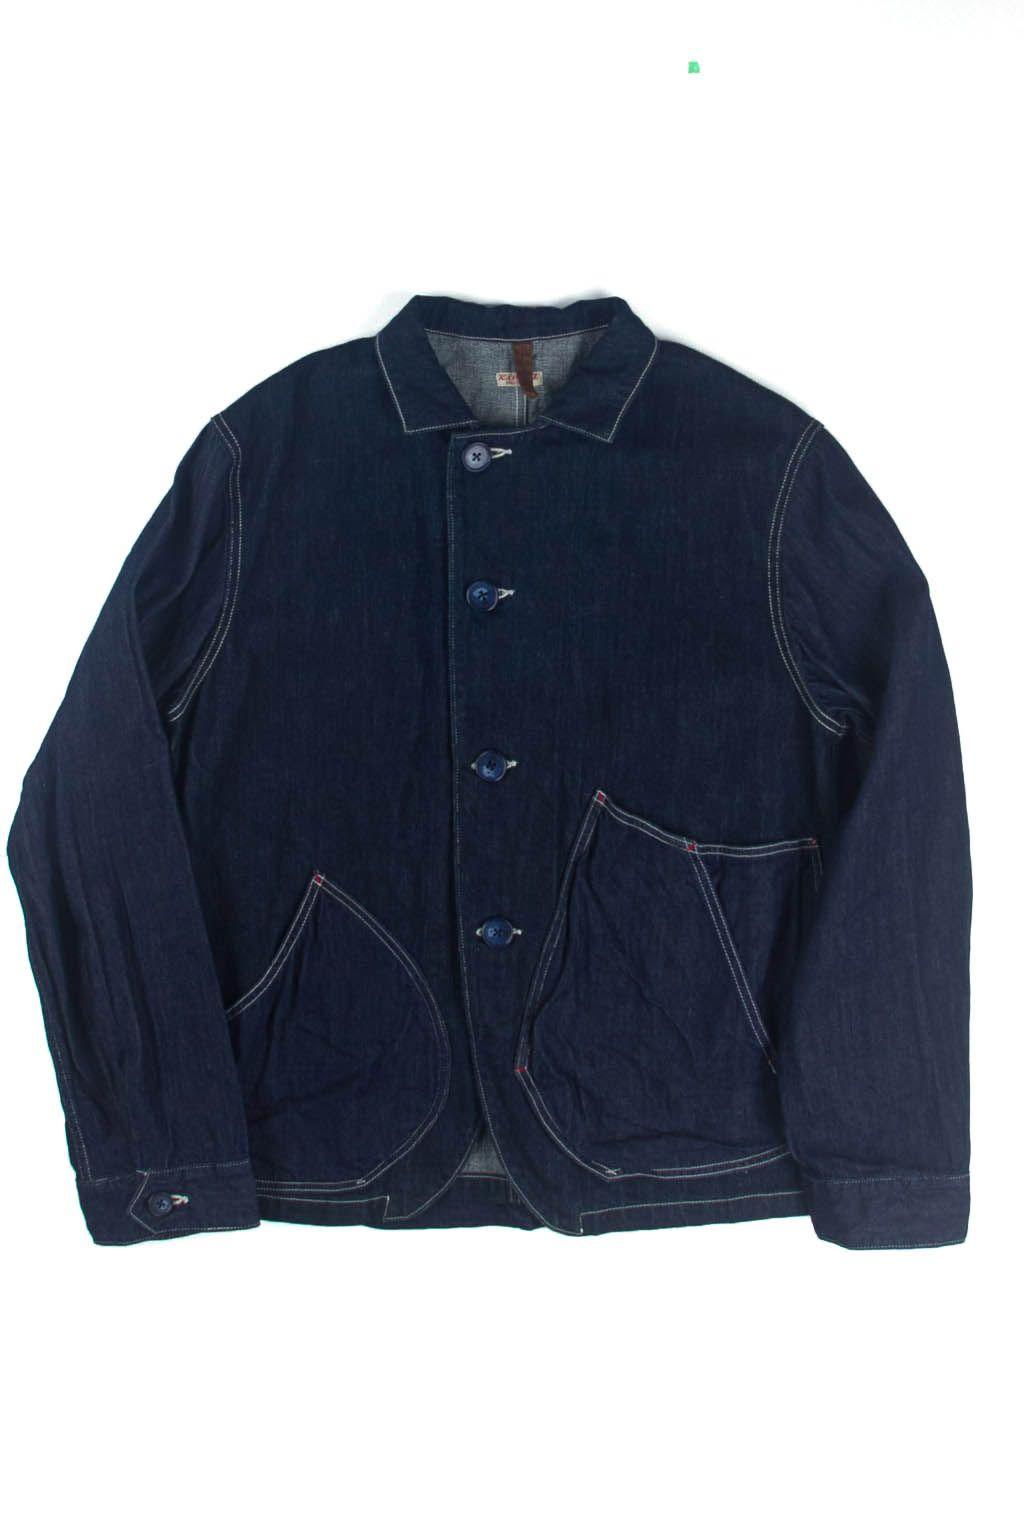 Blue Button Shop - 12oz Denim x 8oz Denim RINGOMAN Coverall - KAP16WJKTMDEN104862